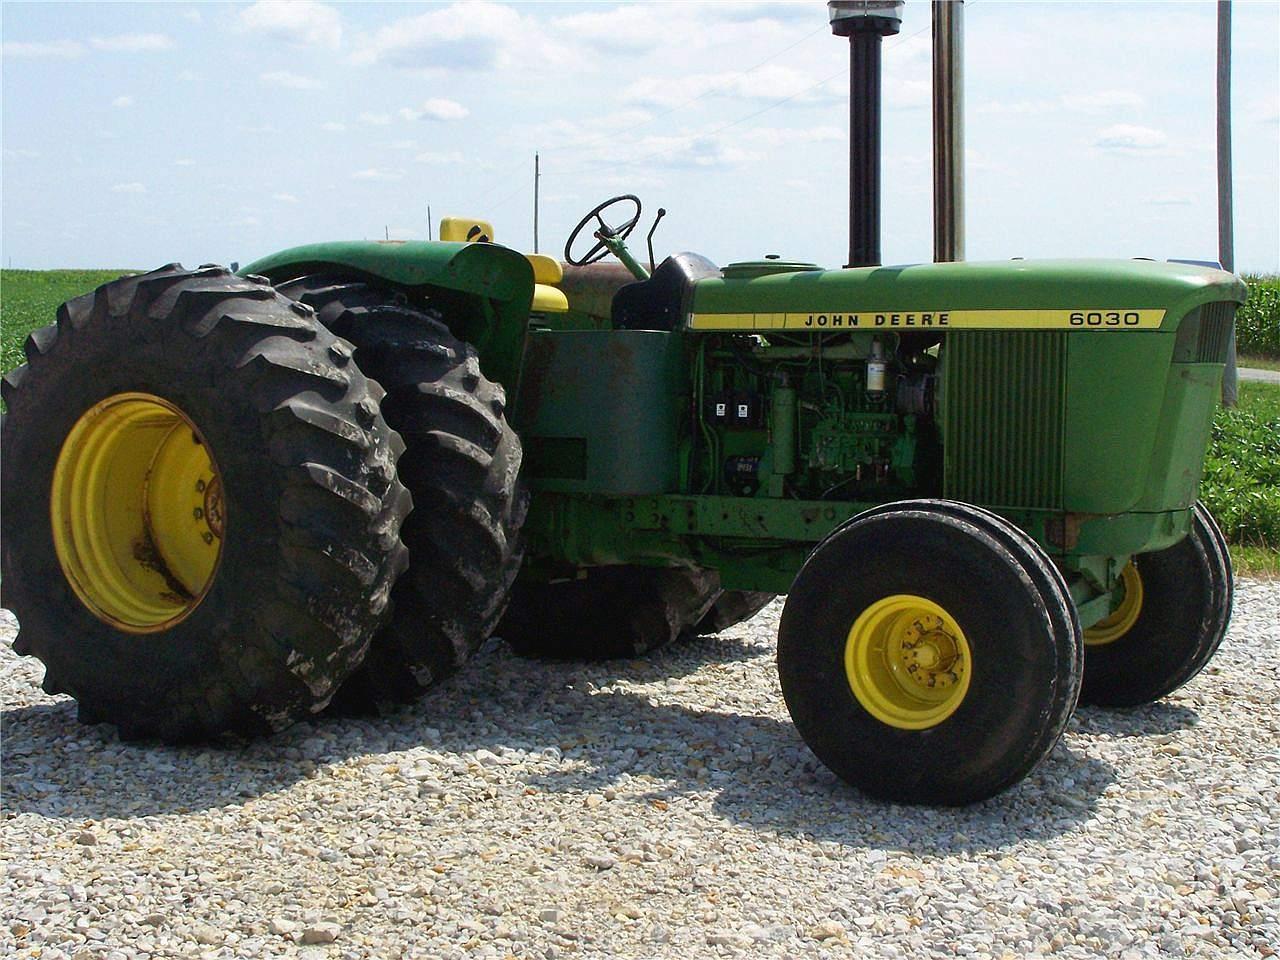 John Deere Dual Wheels : John deere tractor construction plant wiki the